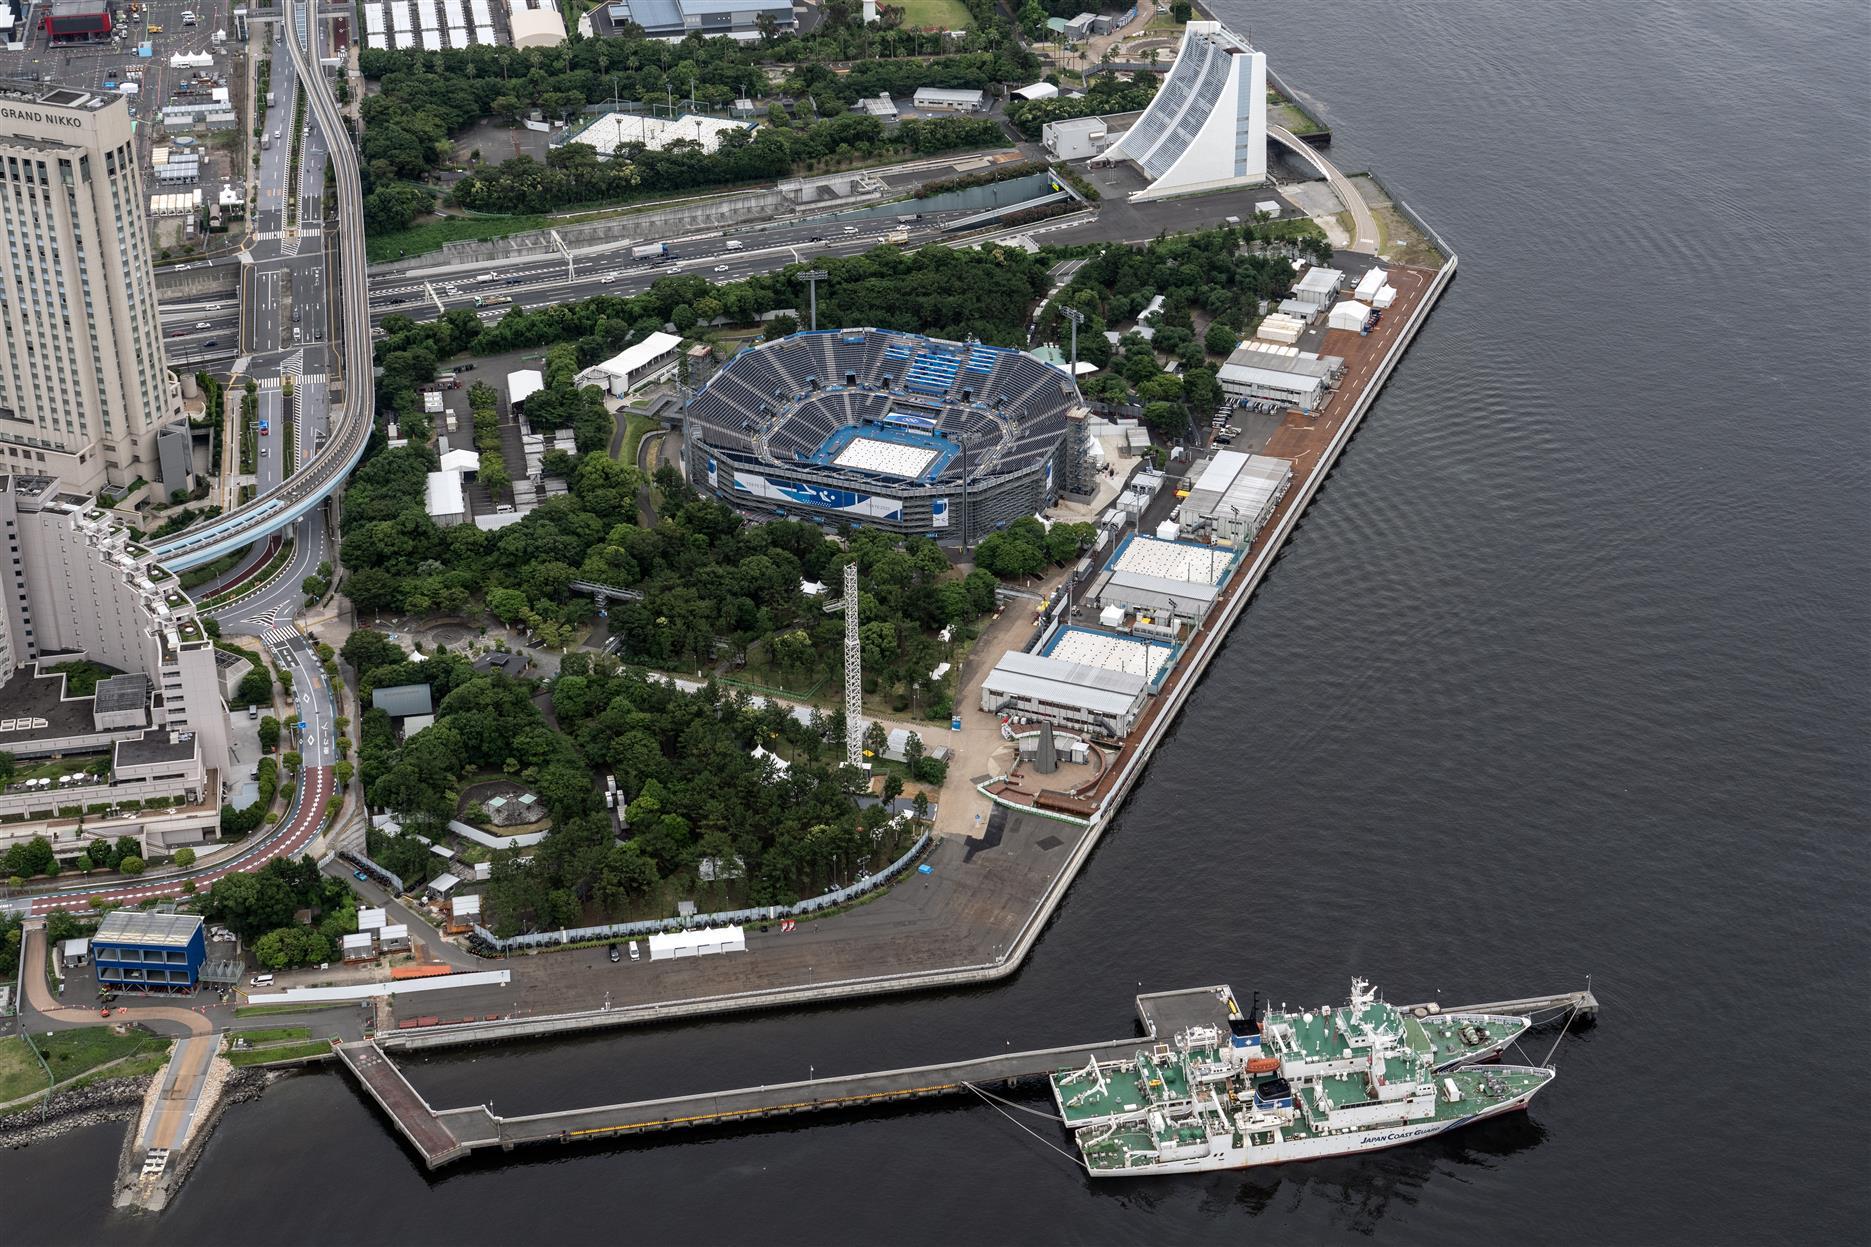 Tokyo 2020 Cost: $15.4 Billion, Others?